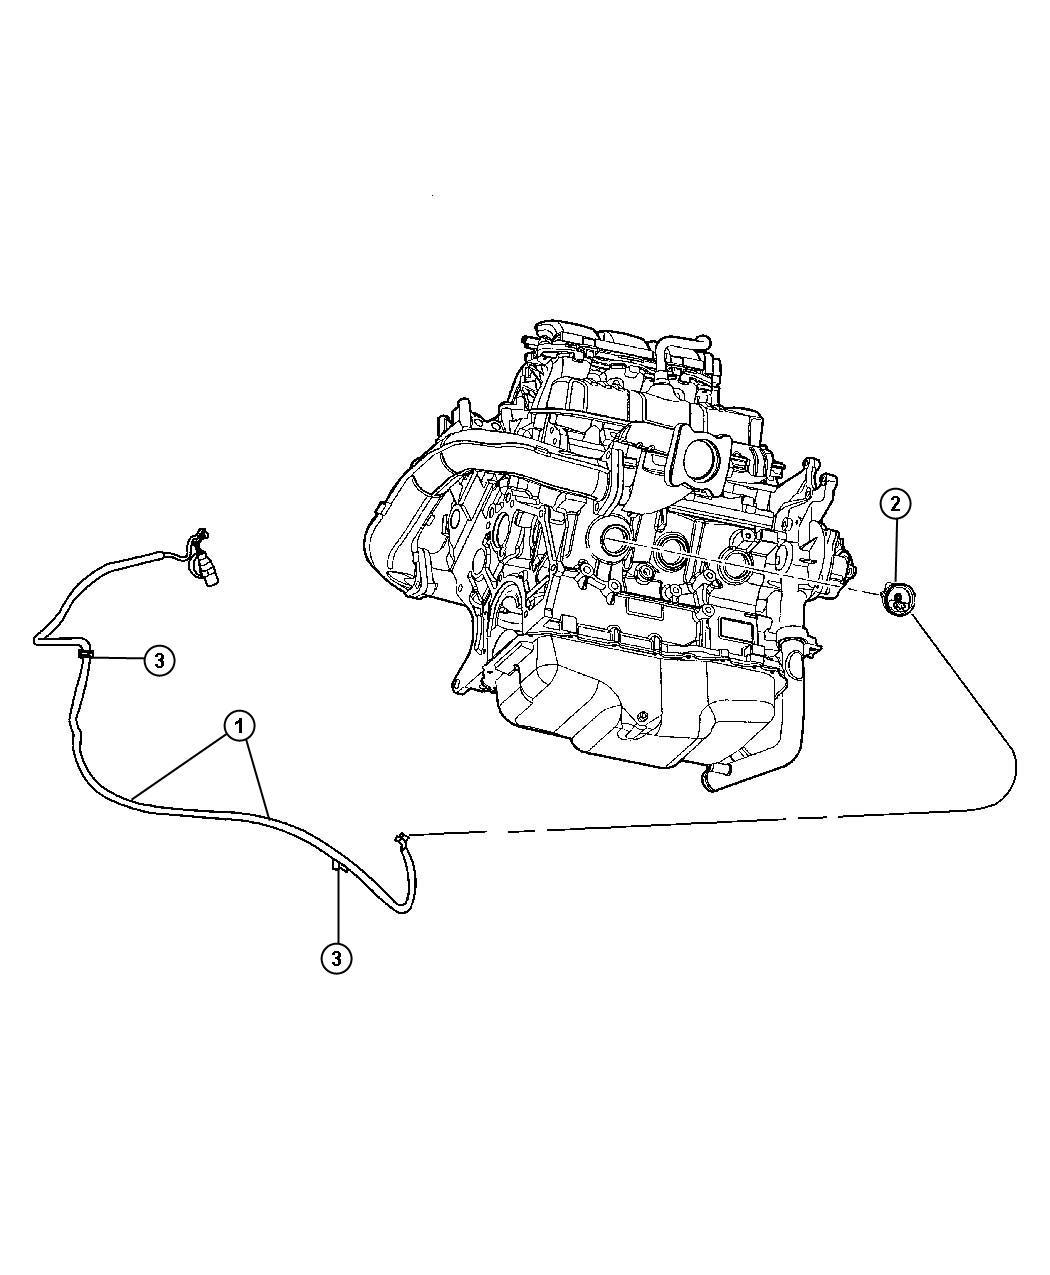 04609550AB  MOPAR Heater    Engine    block Engnie   Factory Chrysler Parts  Bartow Fl